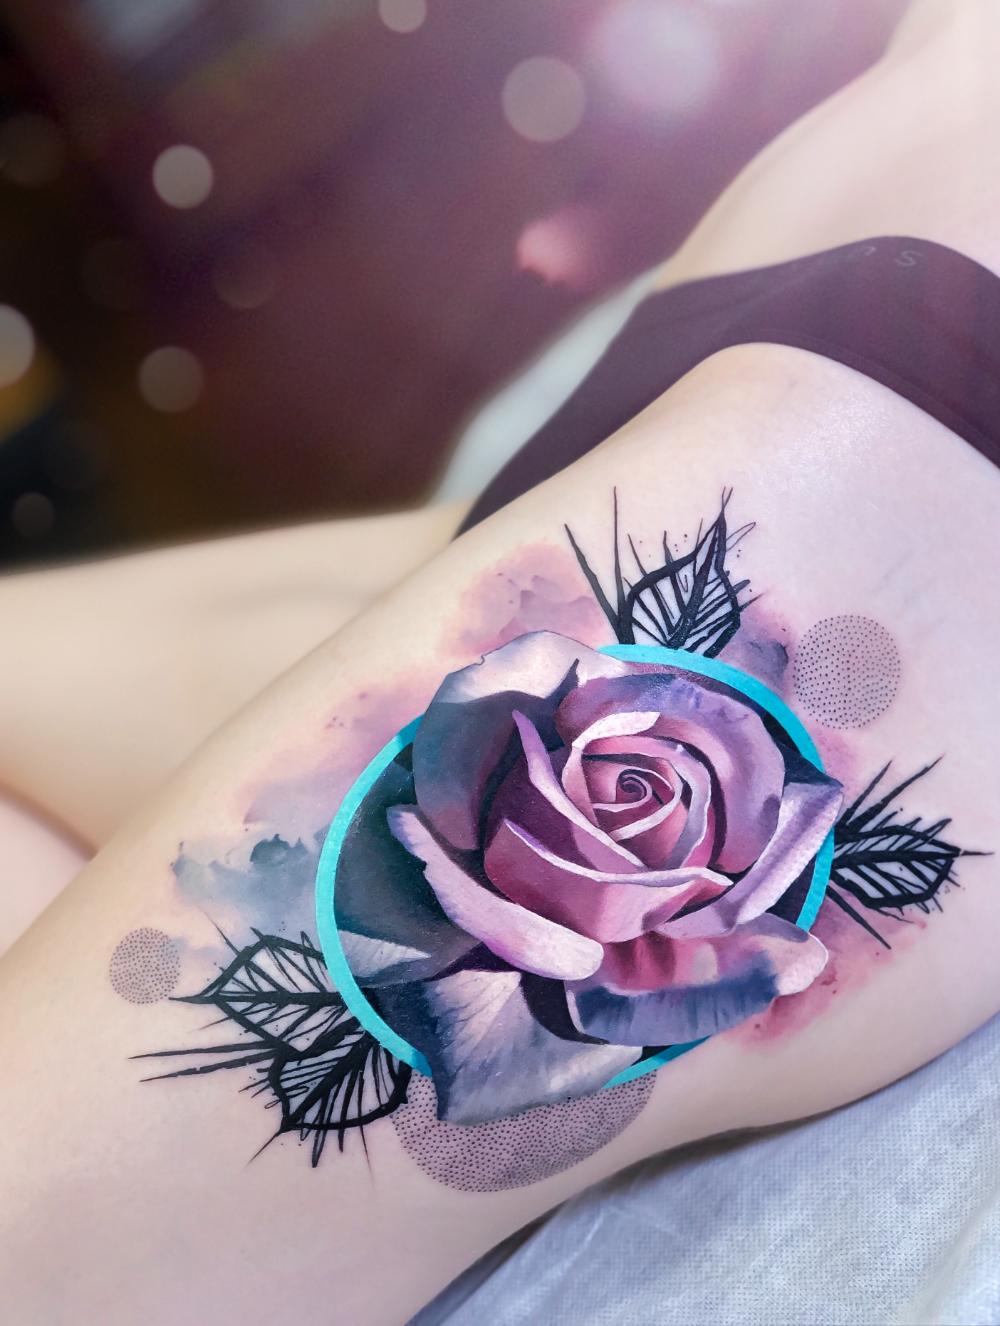 Rose for 'Not That Kind Of Molly' Thanks sweet. . . . . Tattooed using #worldfamousink @worldfamousink @fkirons #fkirons #spektraxion #direkt2 @_numb_skulled #_numb_skulled @blackworksupply @tattoodo Ambassador #tattoodo @bloodlinesinknorthperth #bloodlinesinknorthperth @aputureteck #aputure #stencilanchored #kwadron #chrisrigonitattooer #chrisrigoni #tattoo #tattooartistmagazine #TattooistArtMagazine #tattooculturemagazine #skinartmag #inkjunkeyz #tattoosnob #tattrx #inkedmag #tattoo_art_worldw